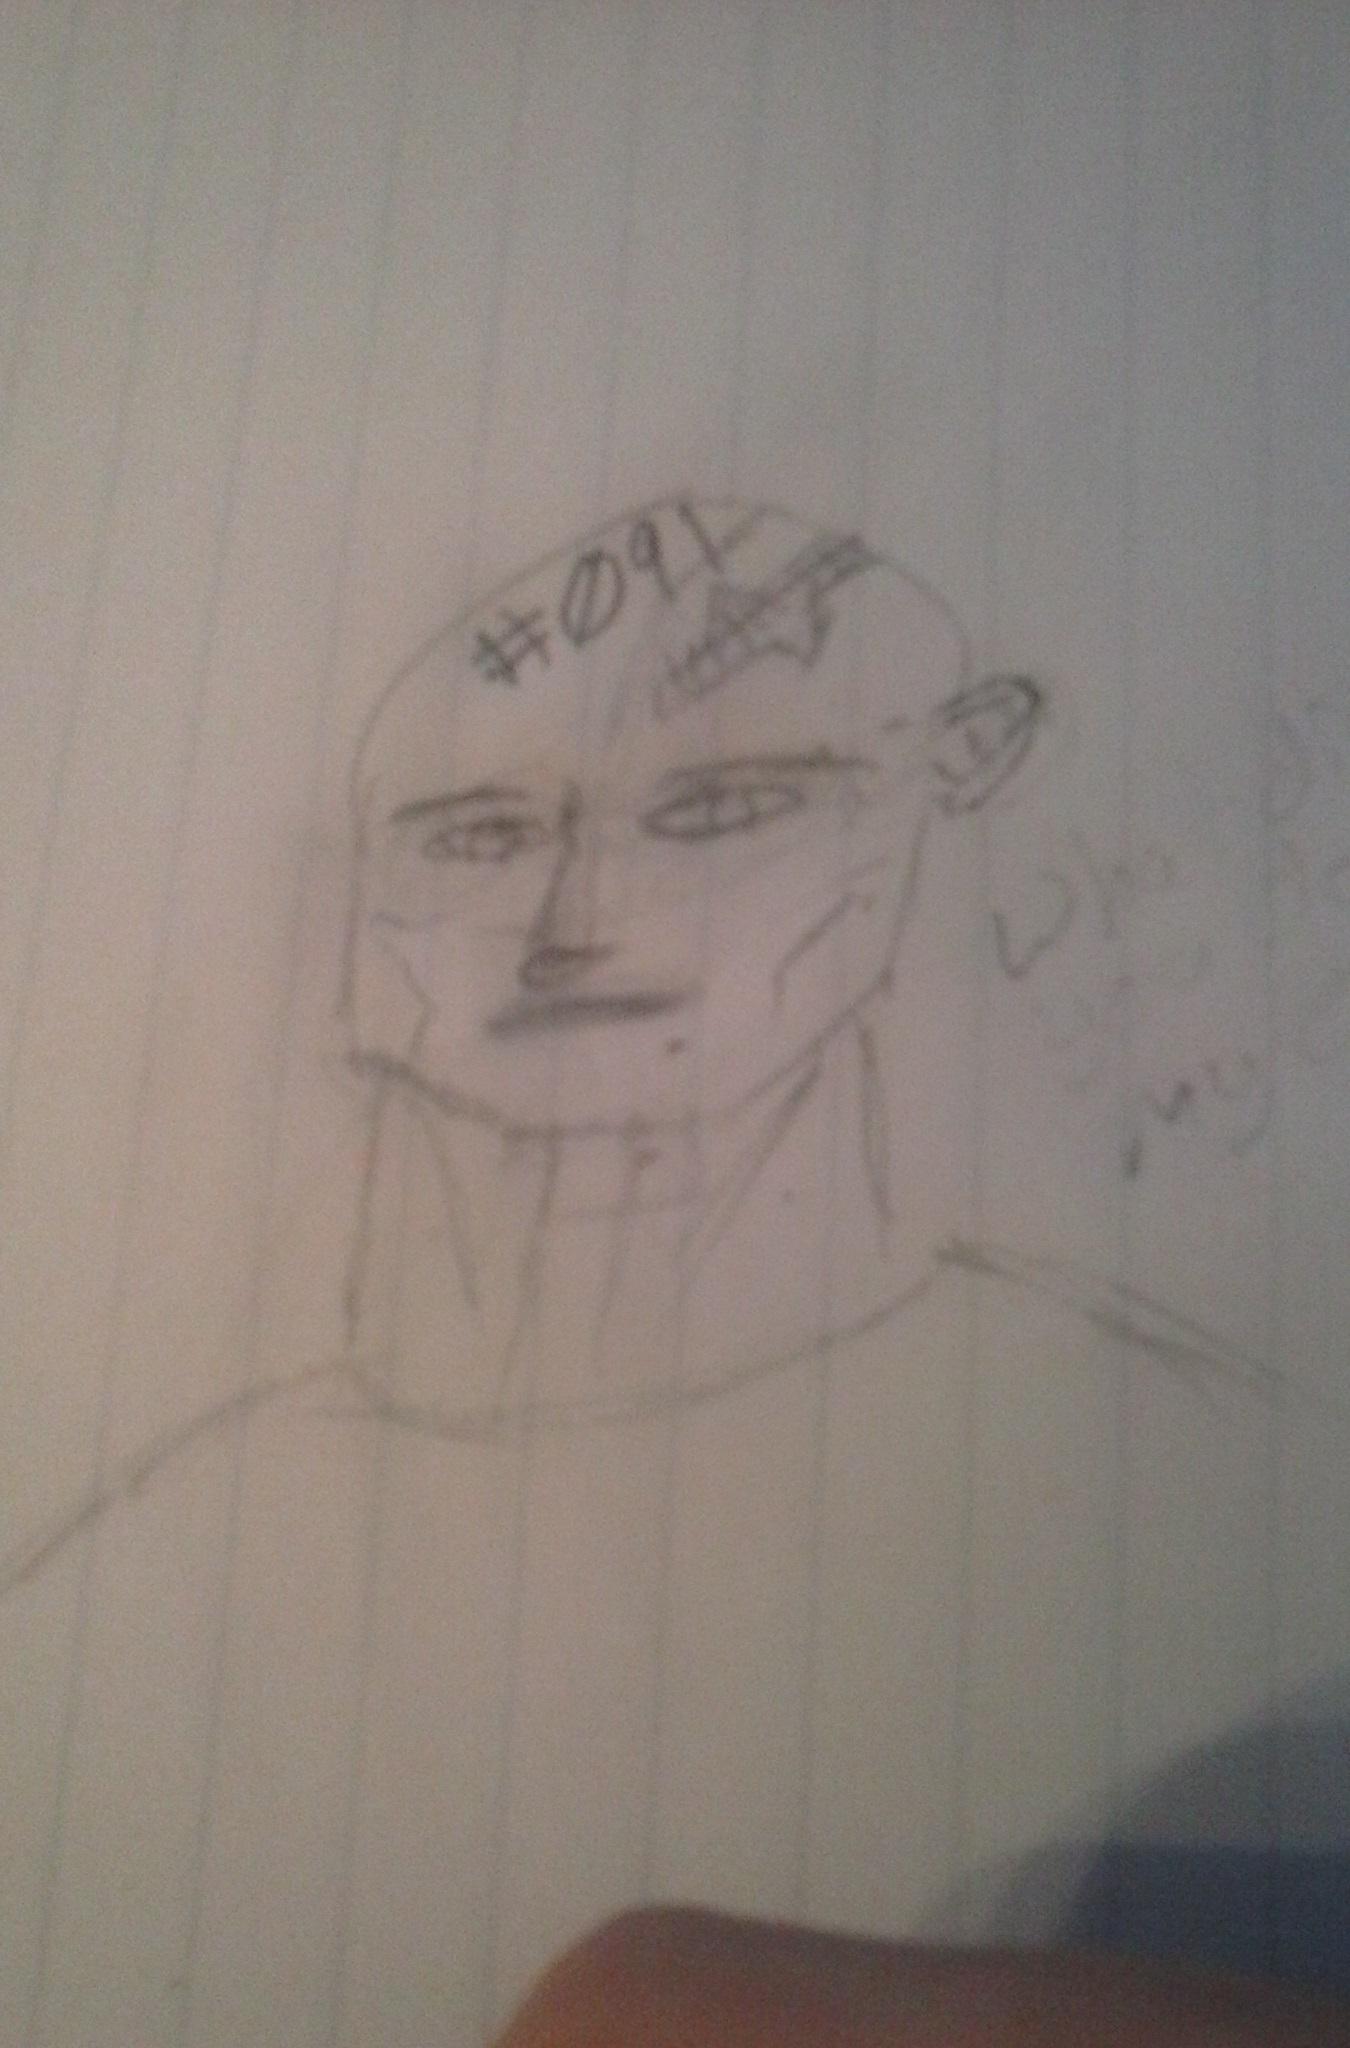 A very rough sketch